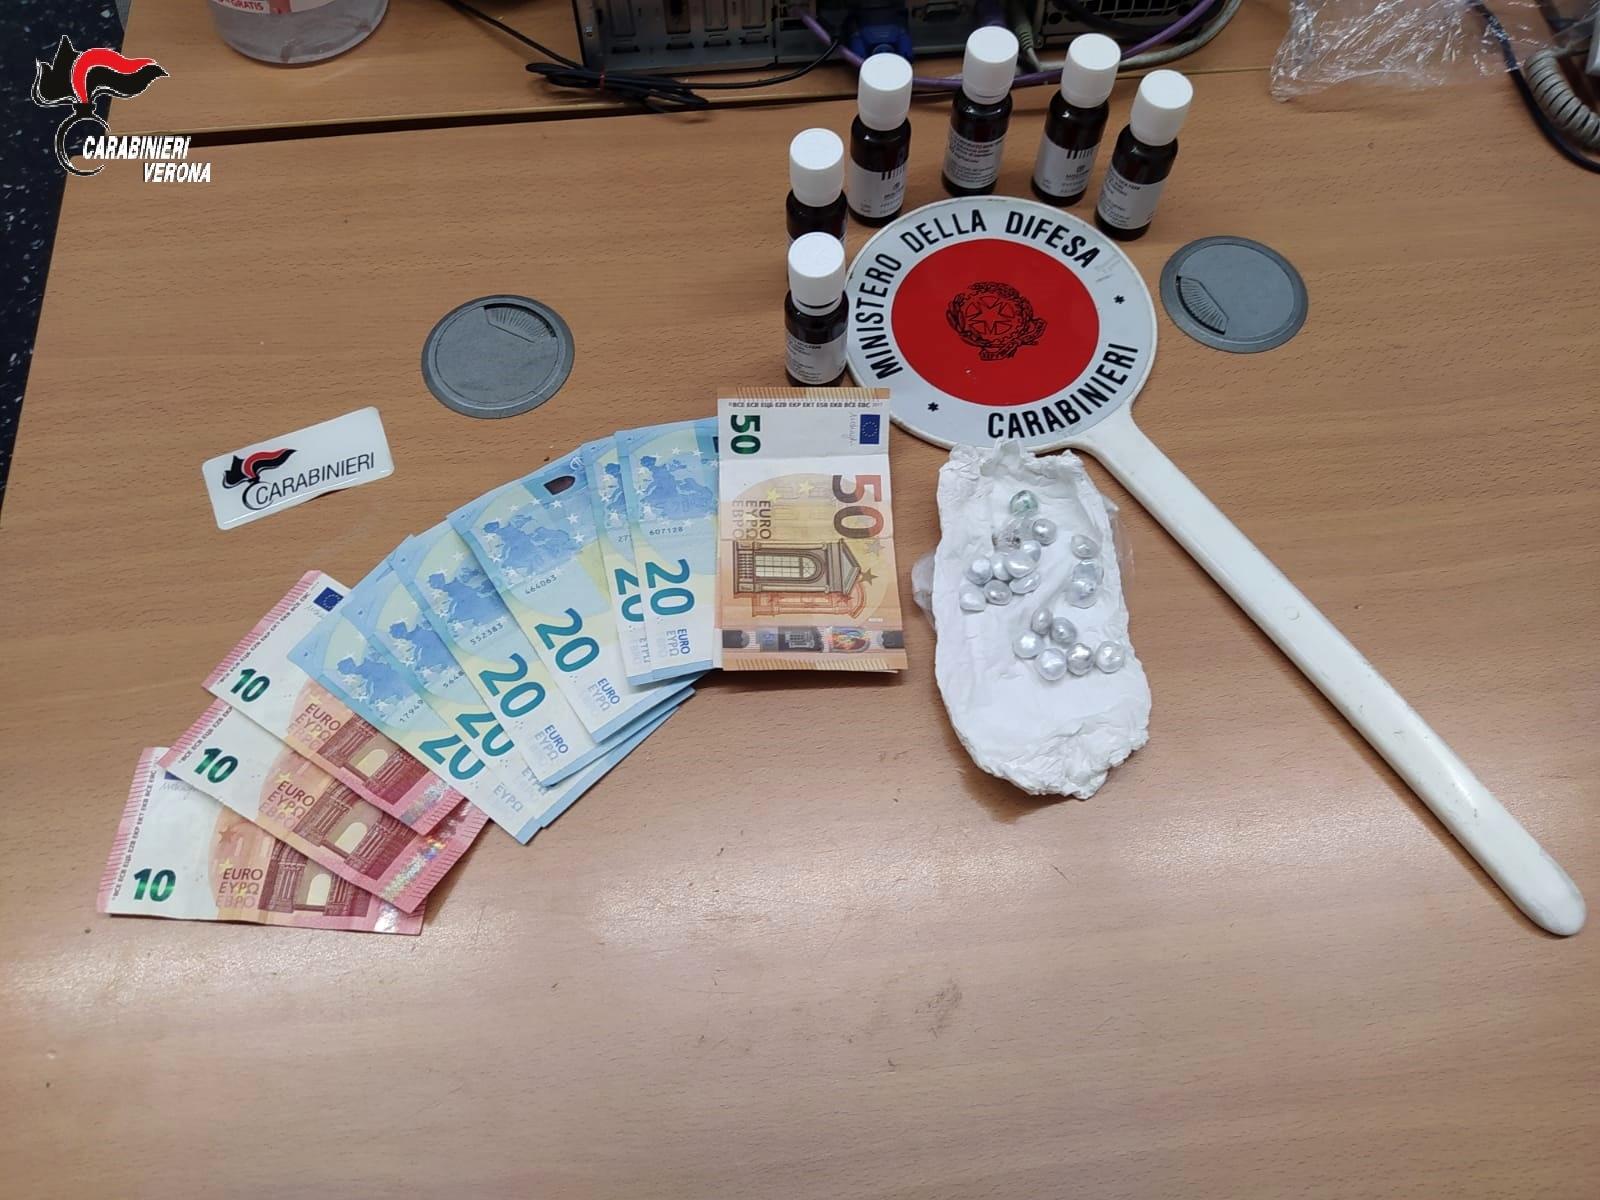 soldi e droga carabinieri verona-2